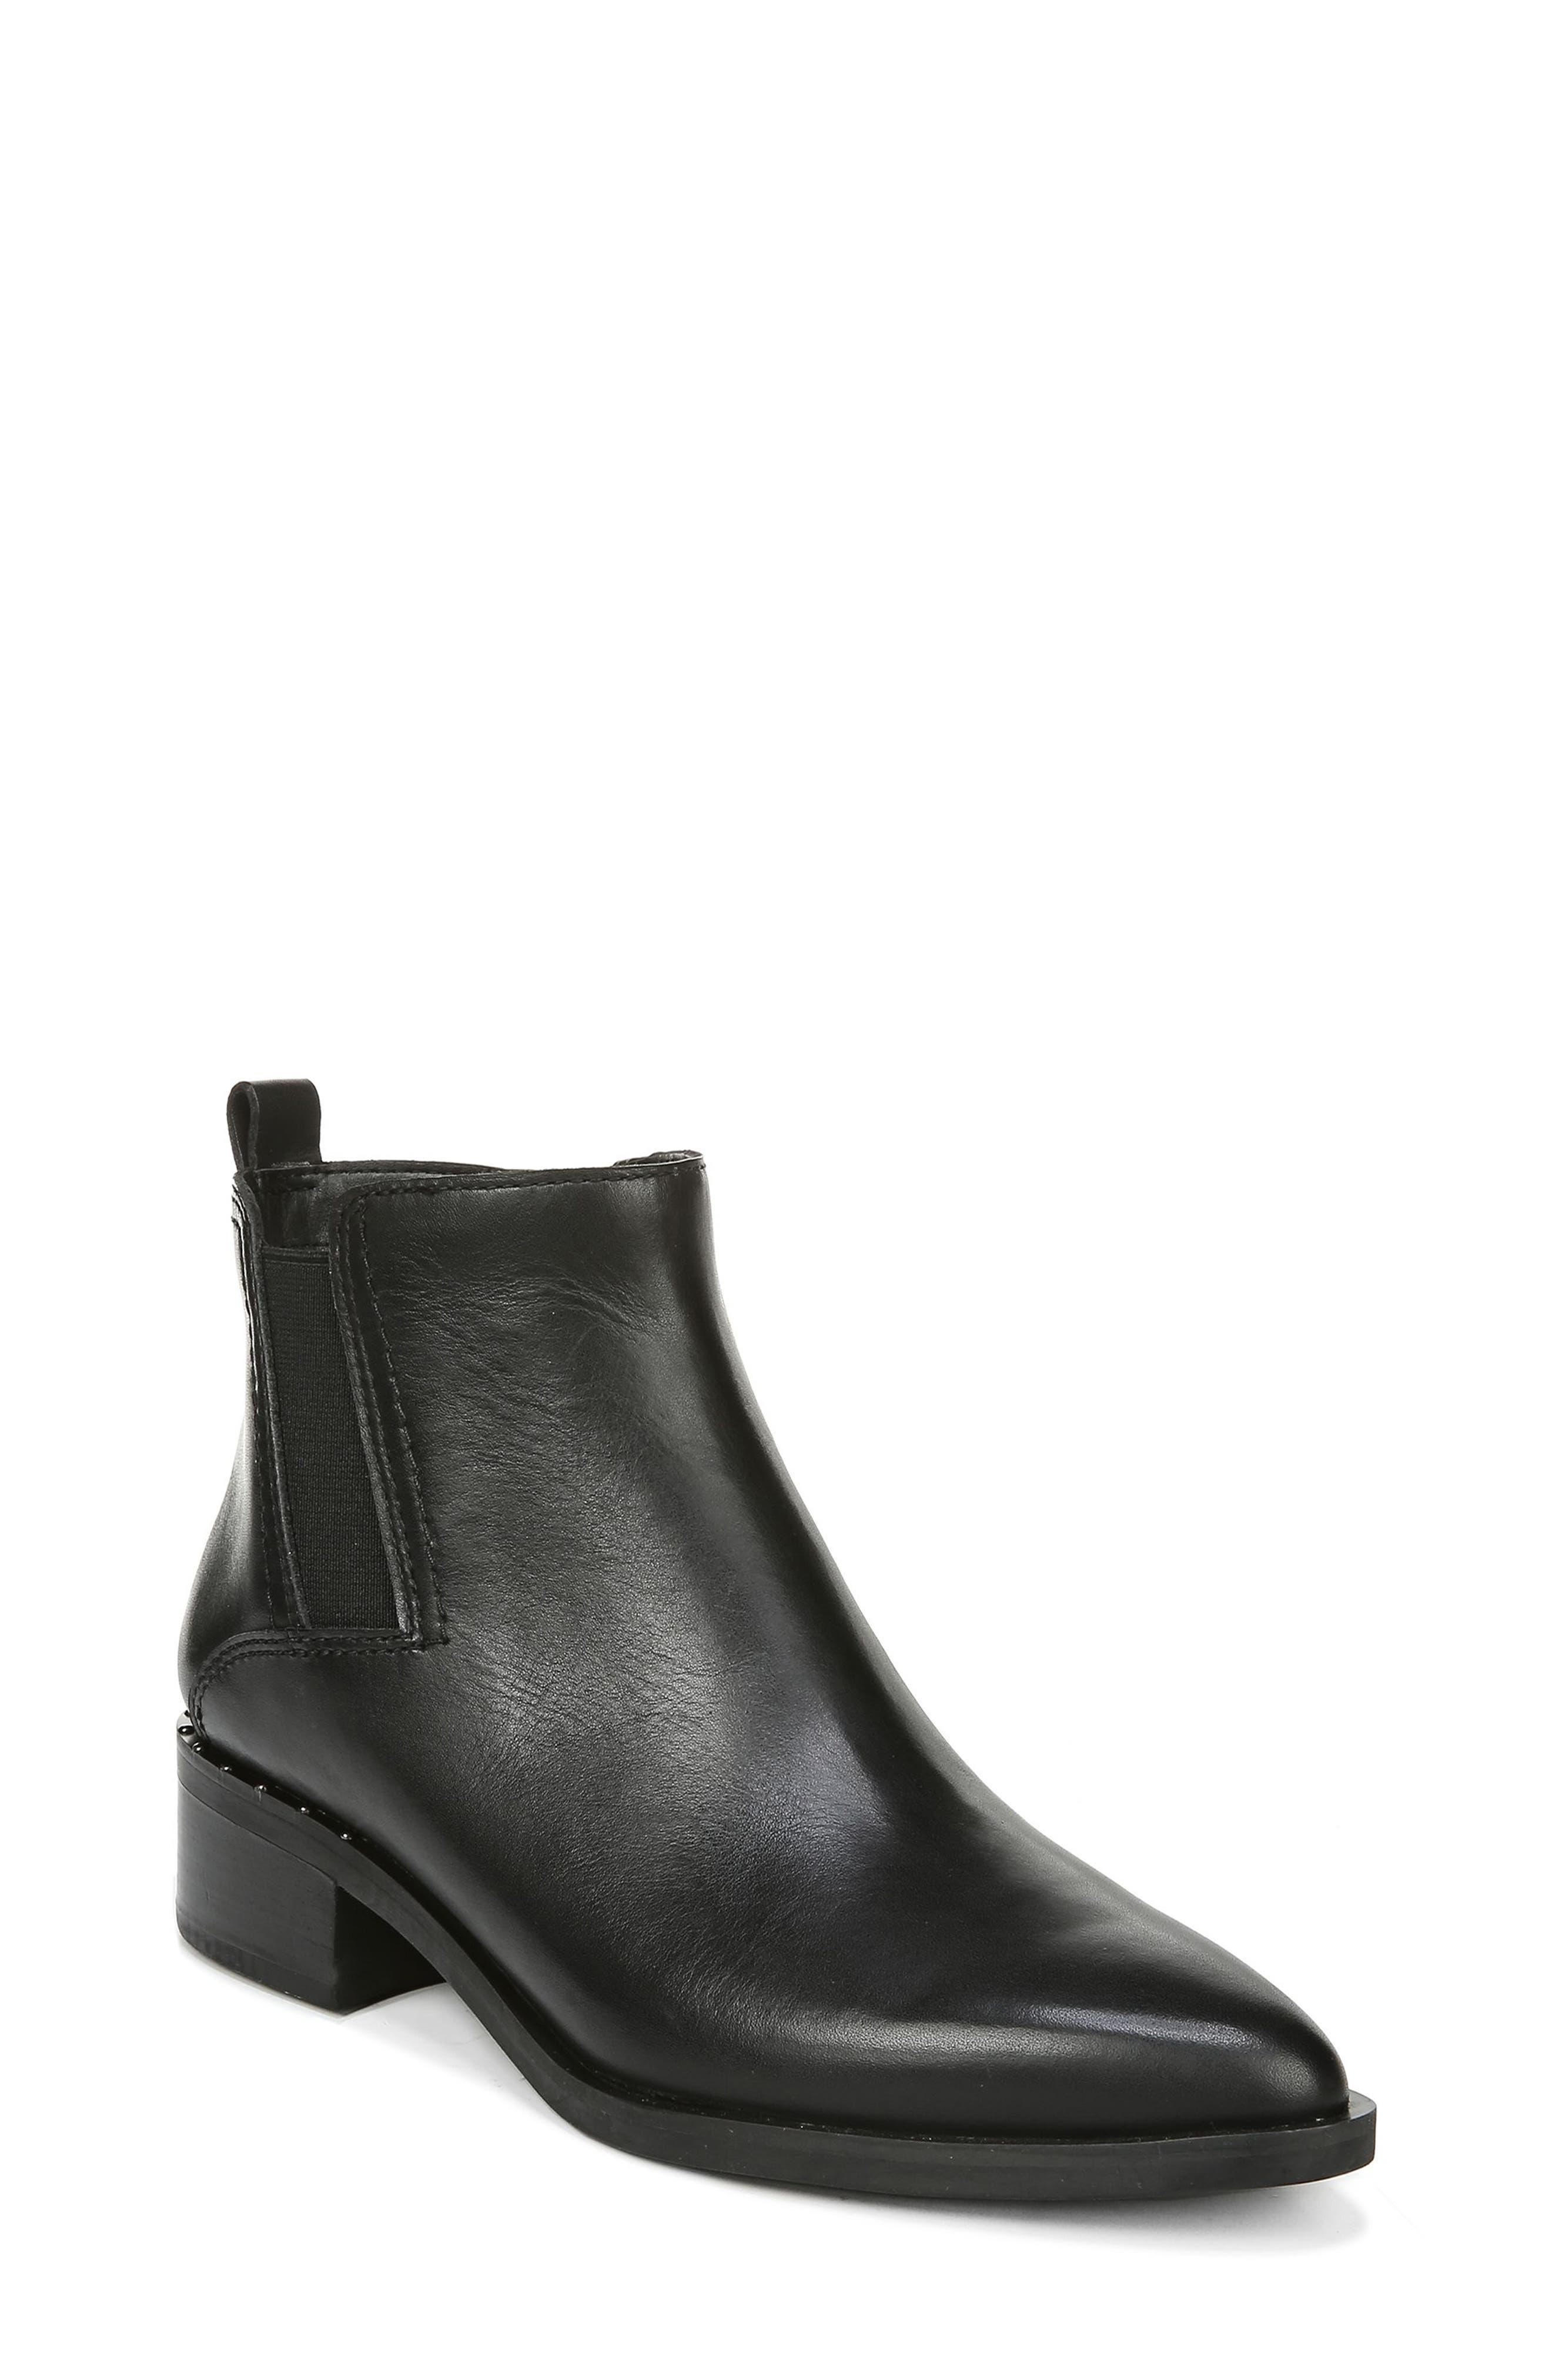 Image of Franco Sarto Domingo Leather Ankle Bootie